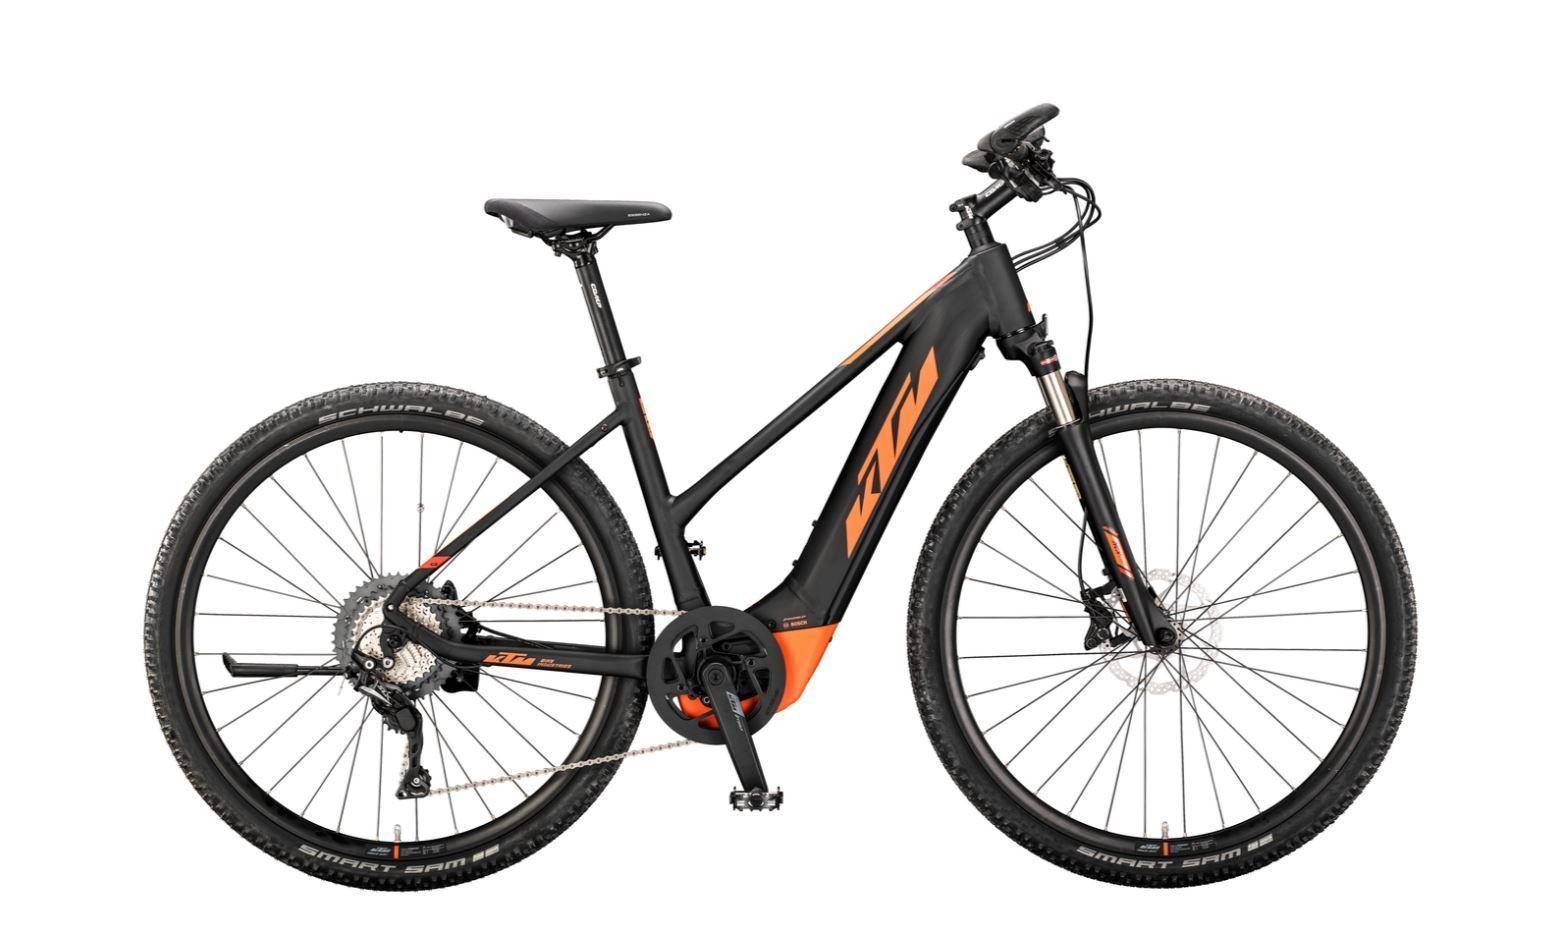 ktm macina cross 620 bosch elektro fahrrad 2020 online preiswert. Black Bedroom Furniture Sets. Home Design Ideas